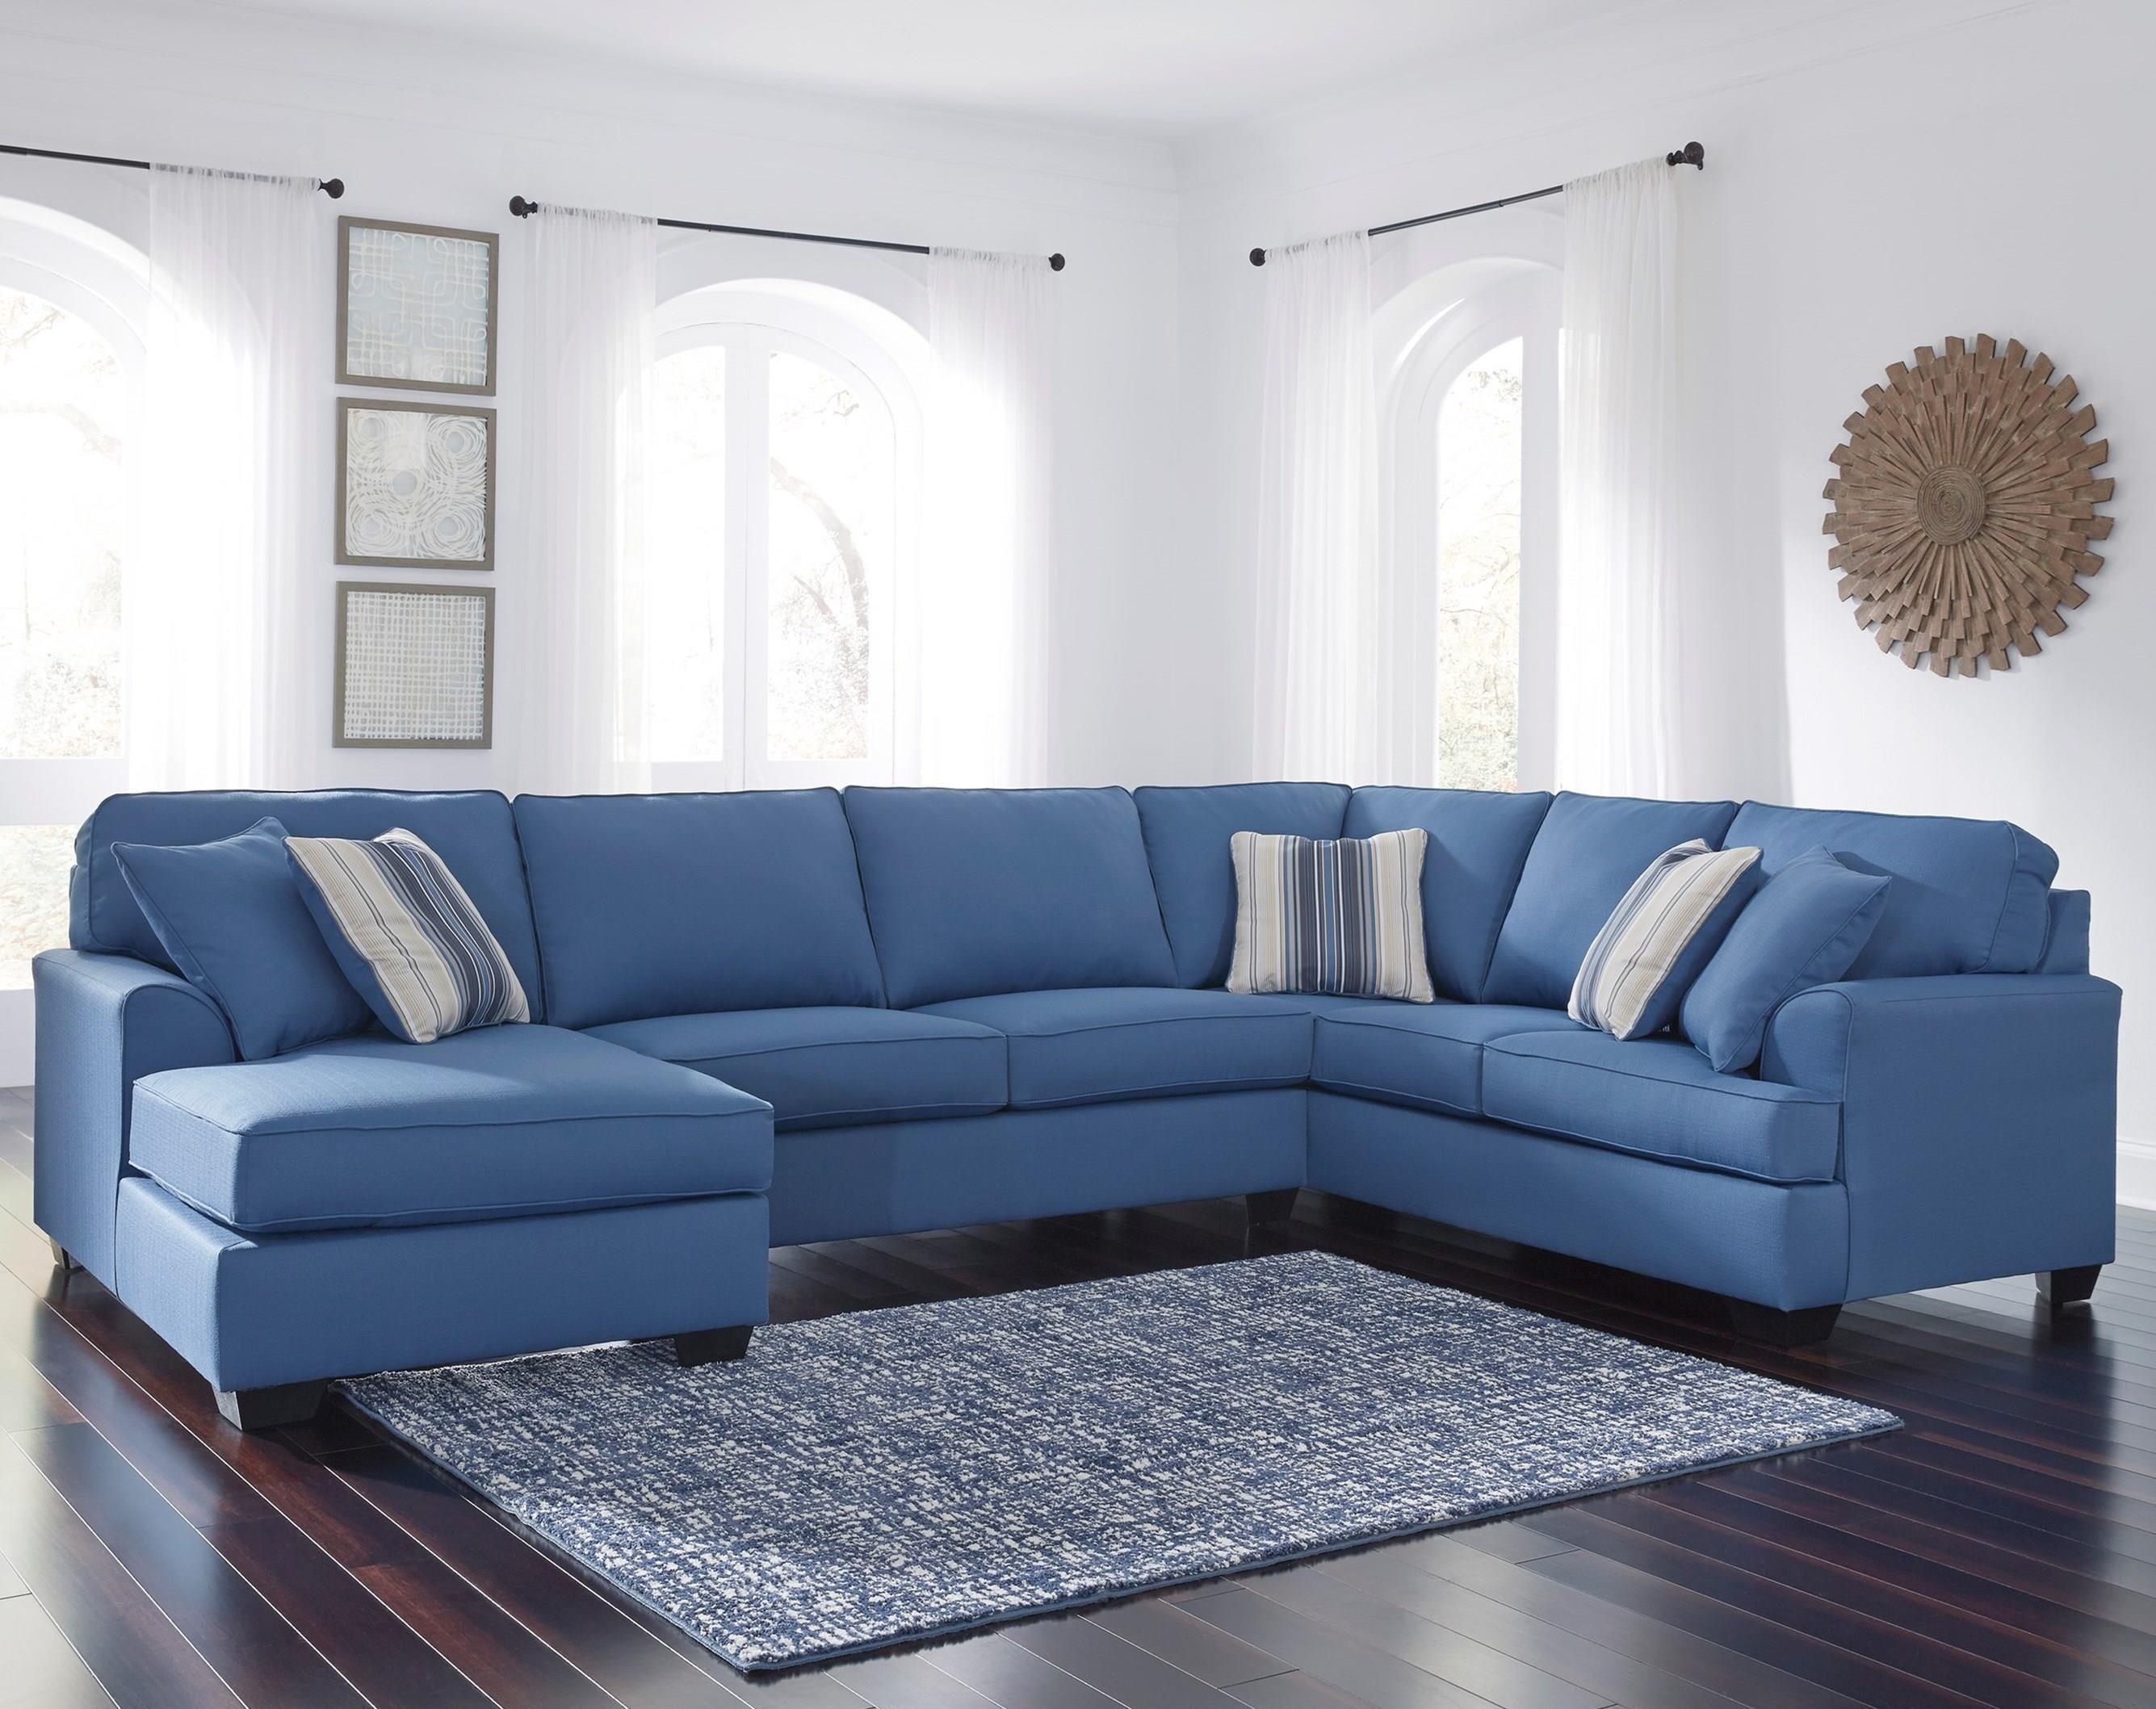 reversible aldie furniture pdx wayfair reviews benchcraft sectional